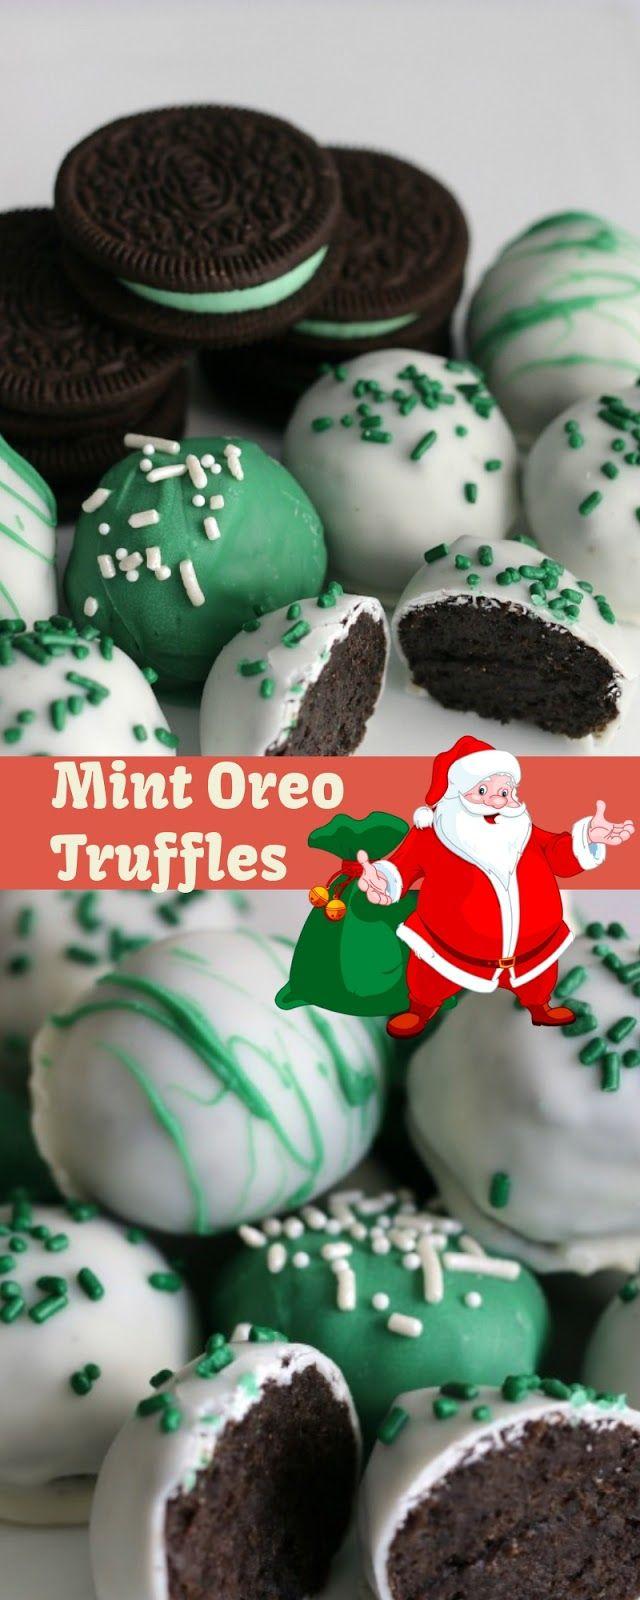 Christmas Desserts Pinterest.Mint Oreo Truffles Christmas Dessert Mariana Kitchen